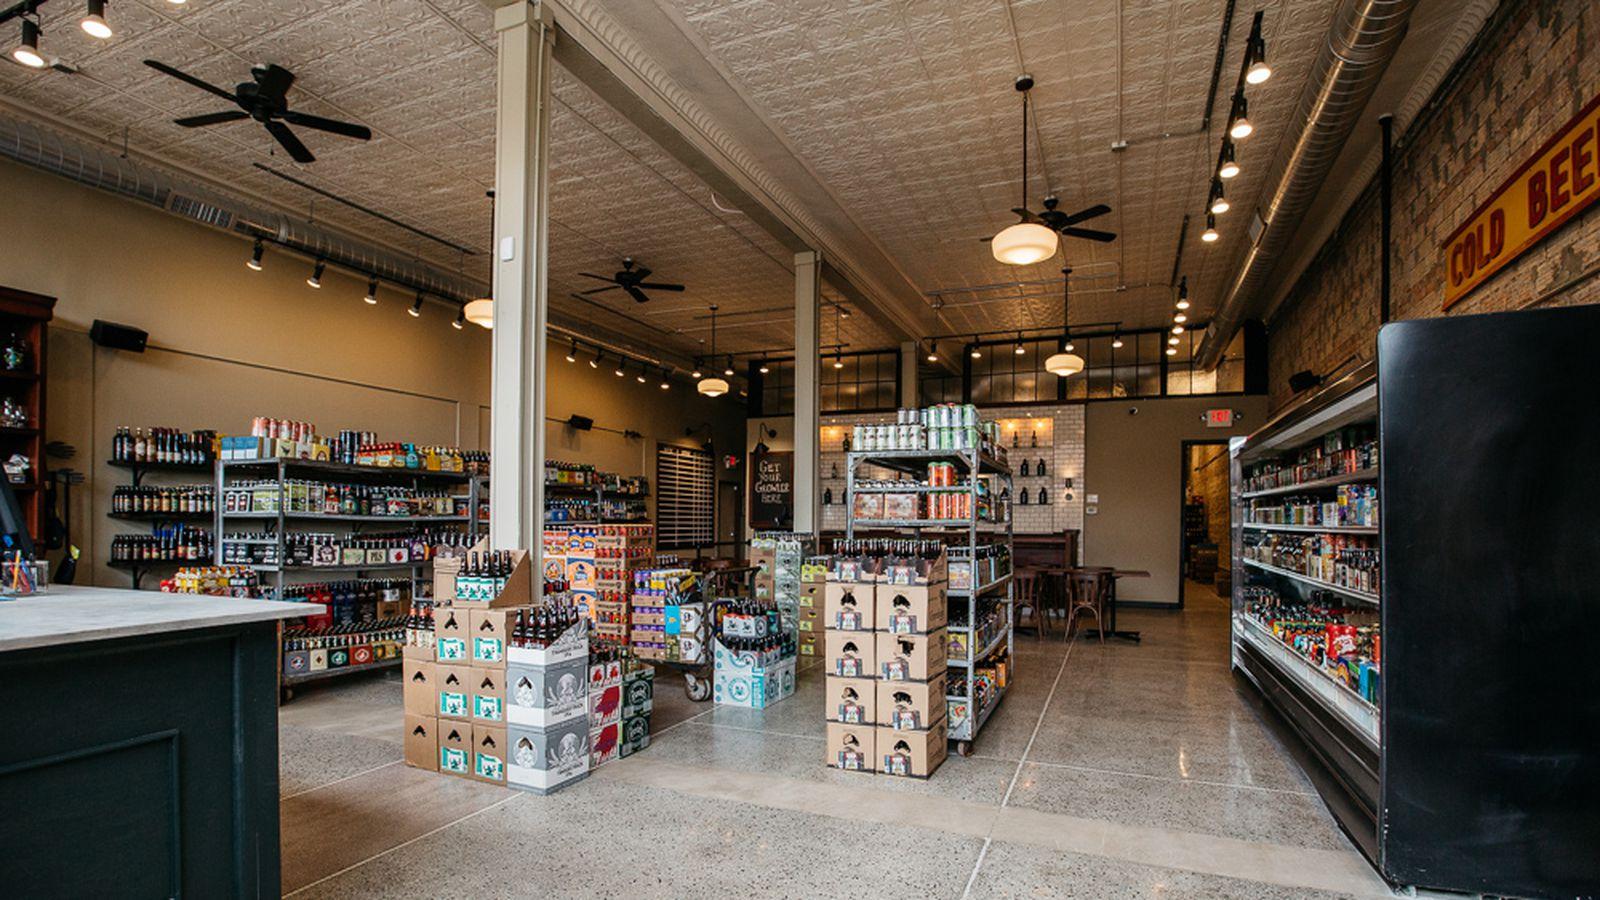 Inside 8 Degrees Plato Cass Corridor S Ambitious New Beer